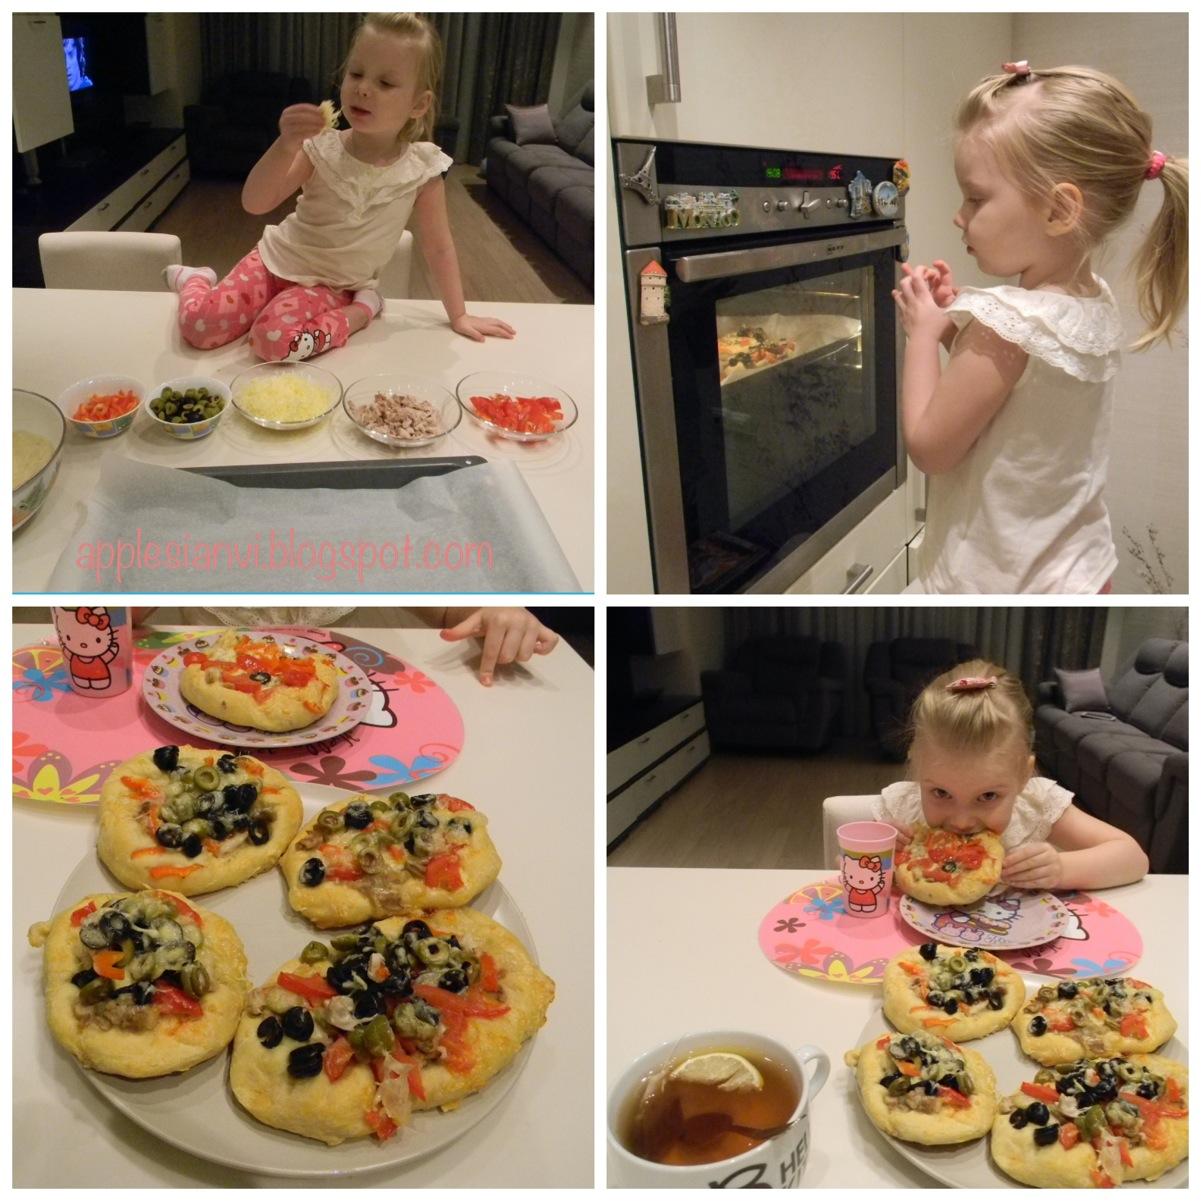 джейми оливер рецепт теста для пиццы